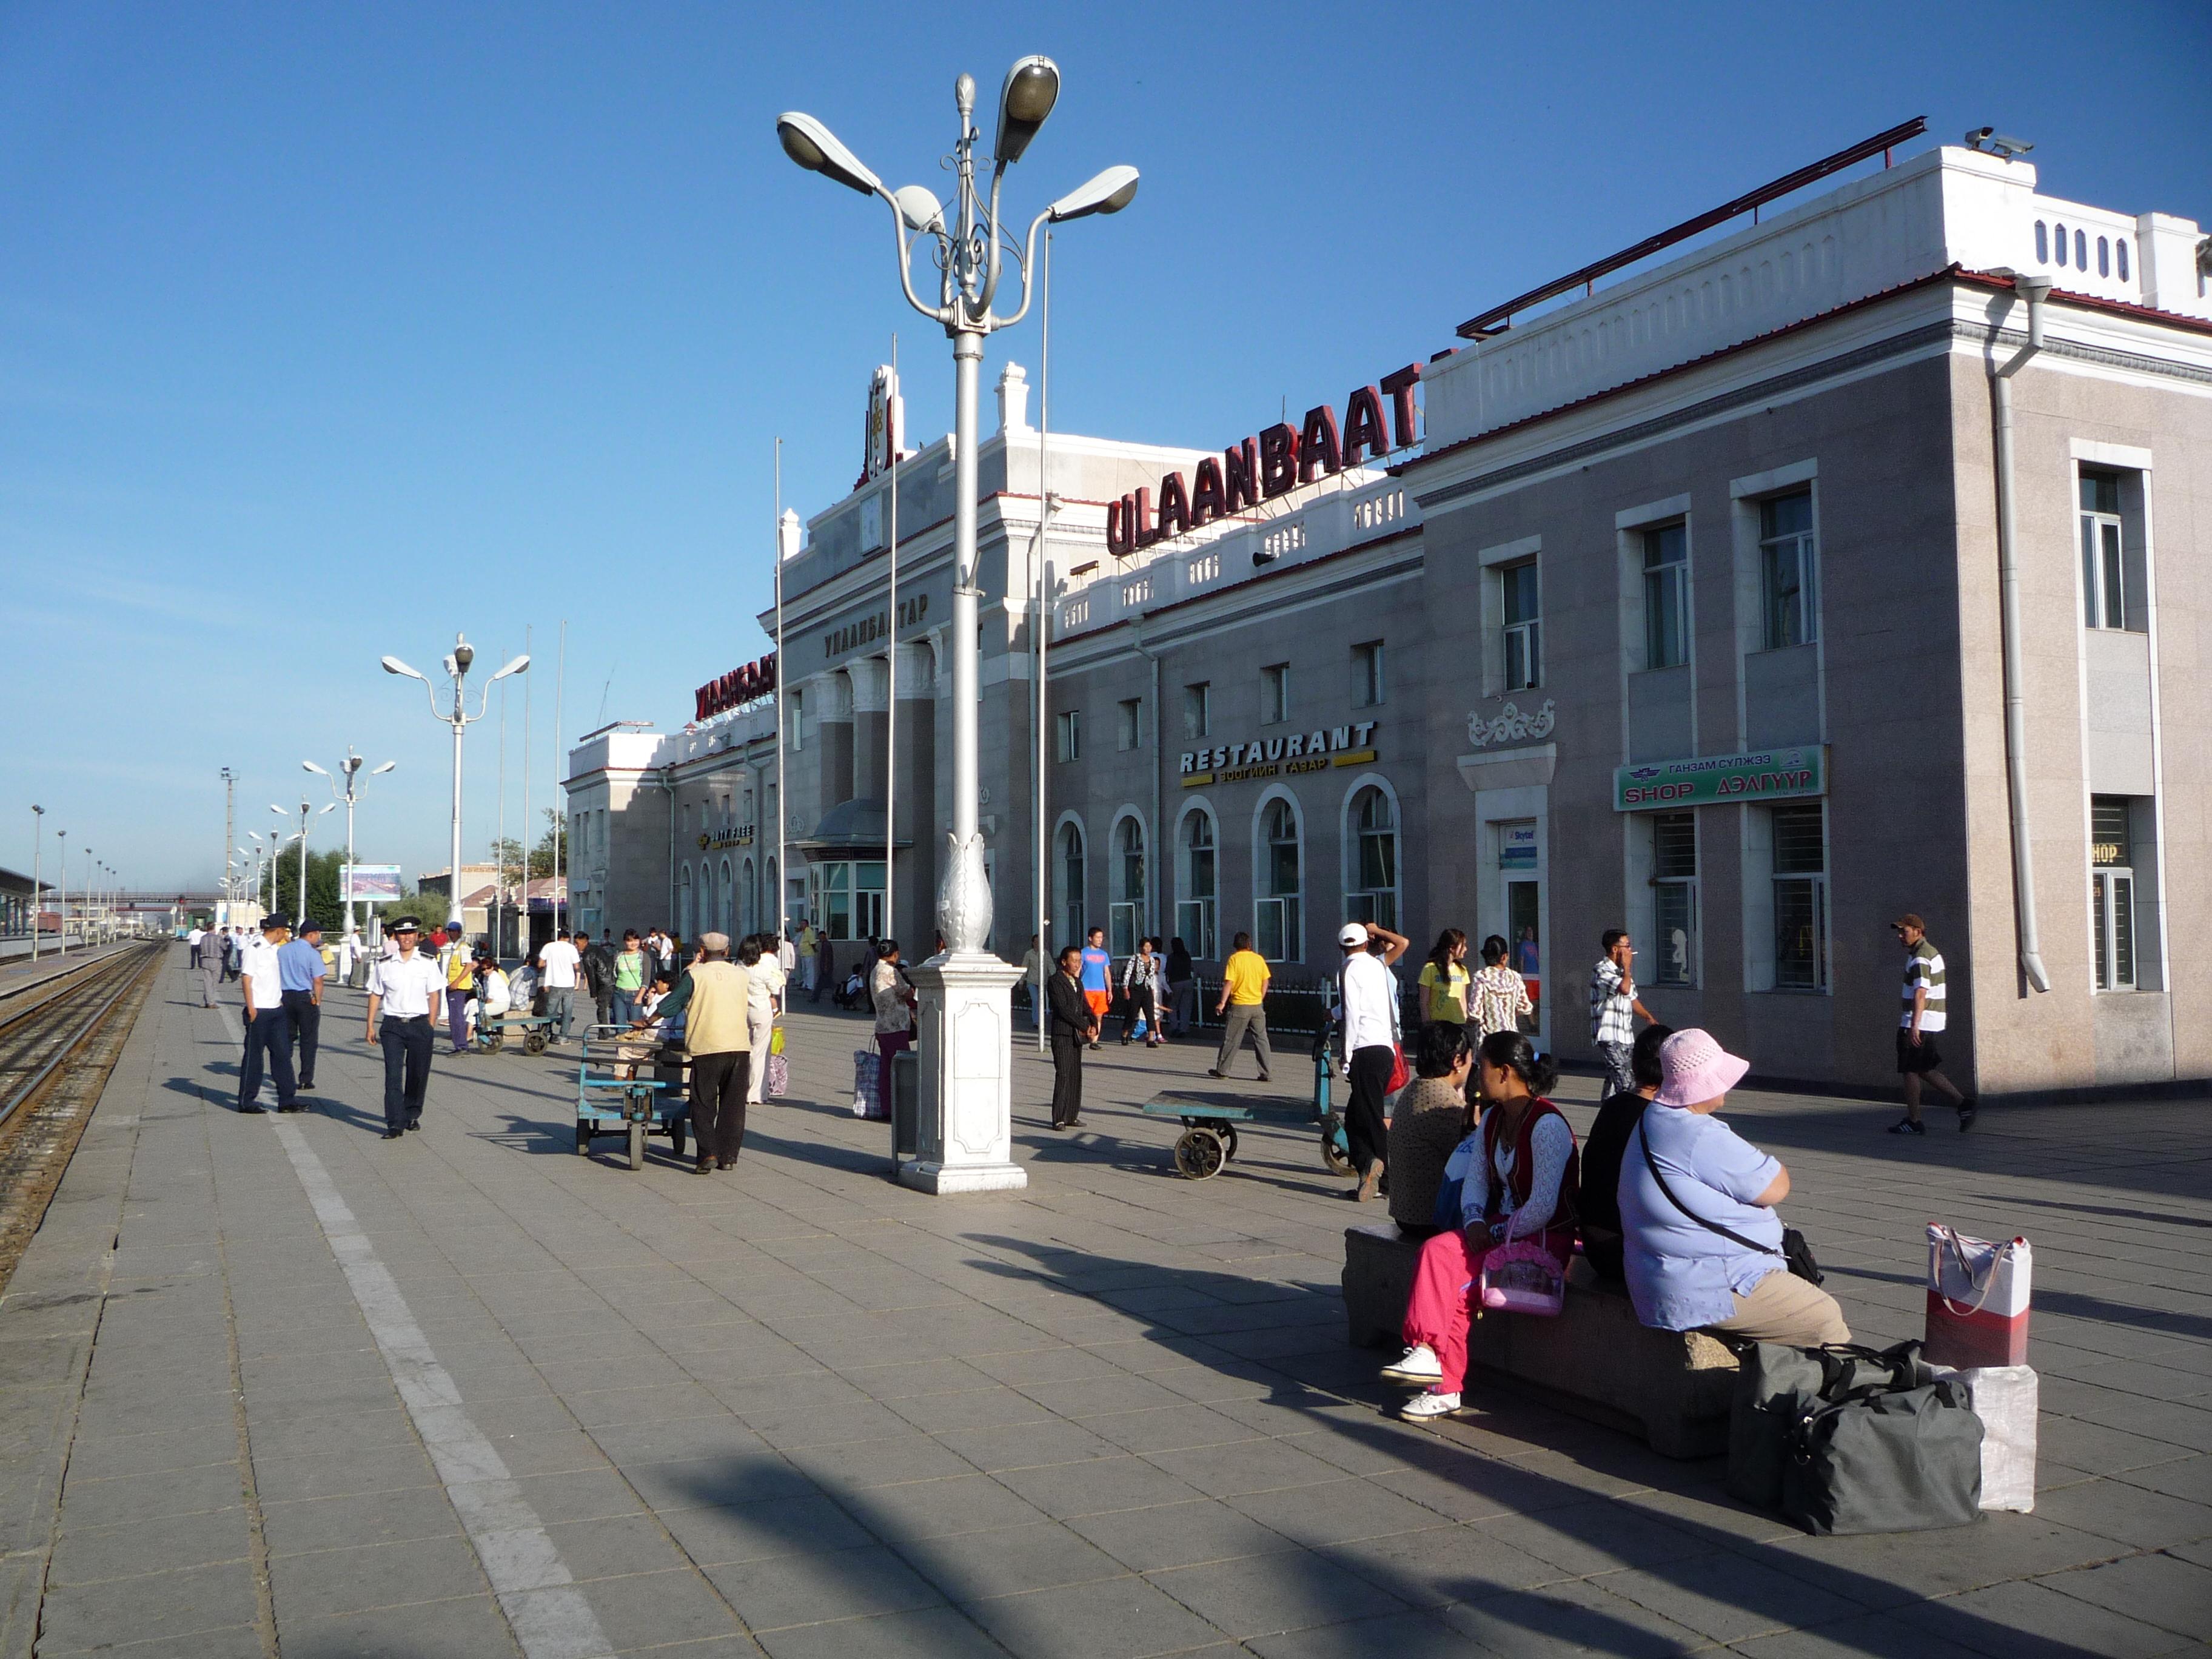 Ulan Bator railway station 2008 1.JPG